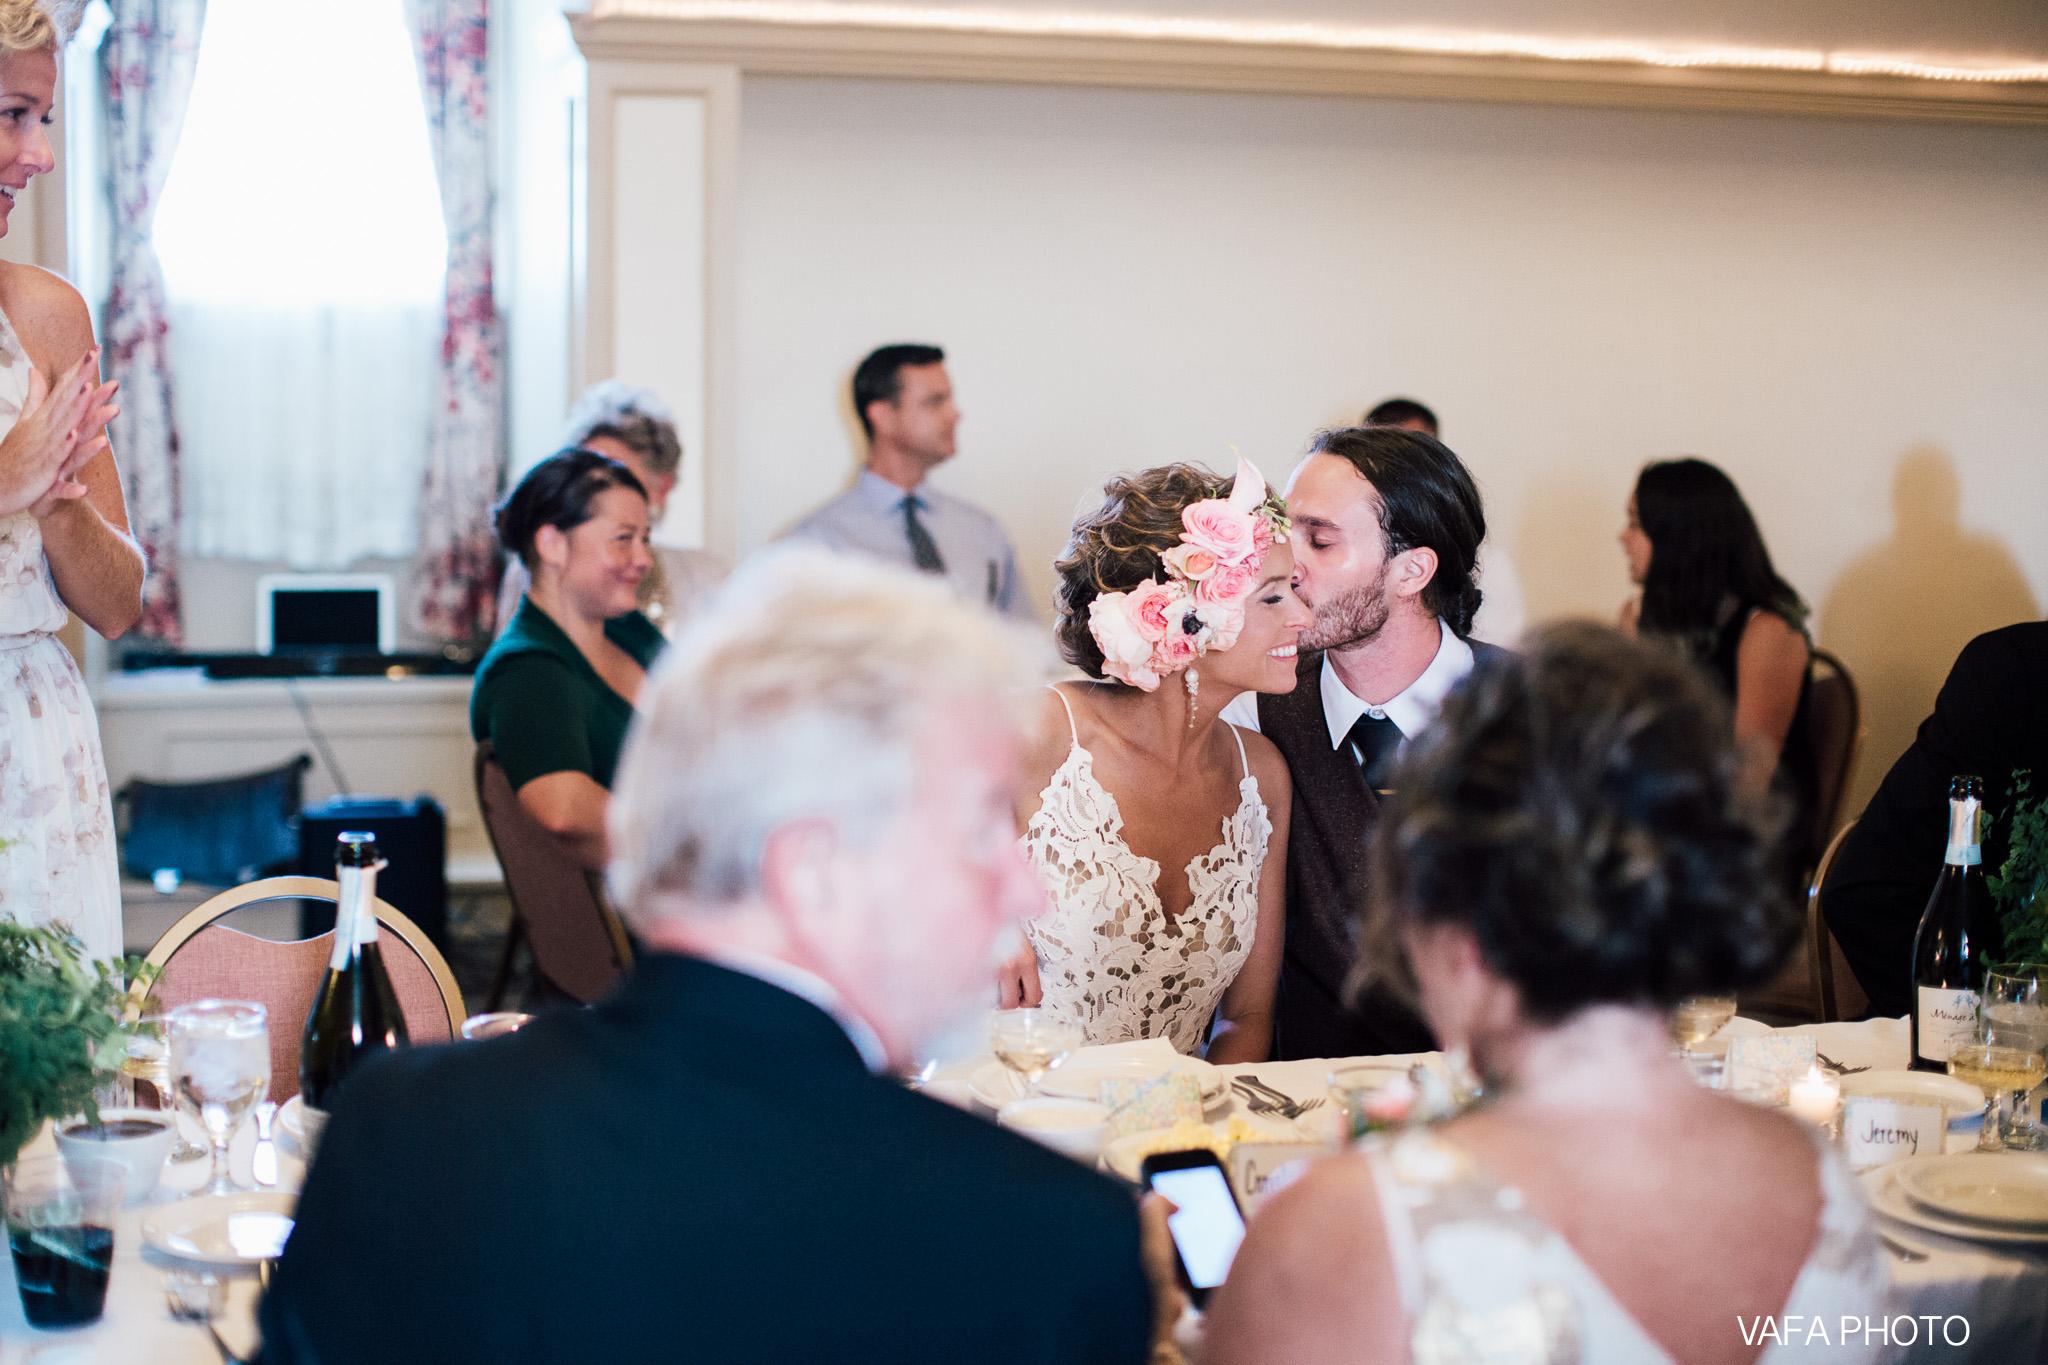 The-Felt-Estate-Wedding-Kailie-David-Vafa-Photo-943.jpg